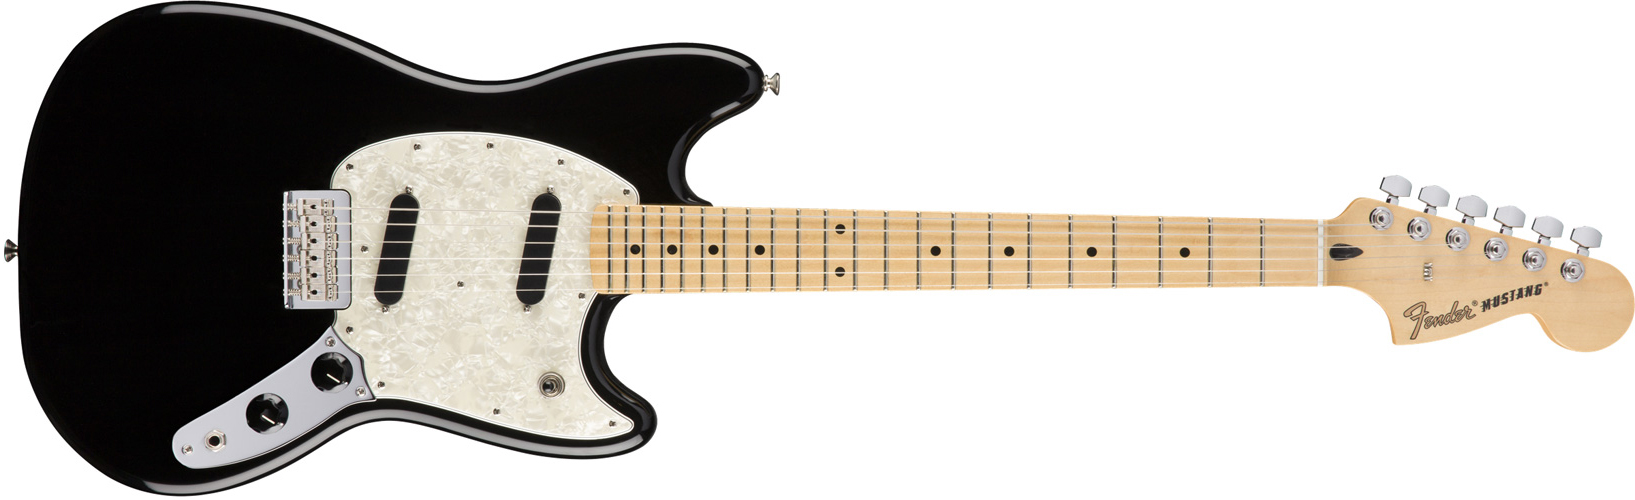 Fender Clic Guitars